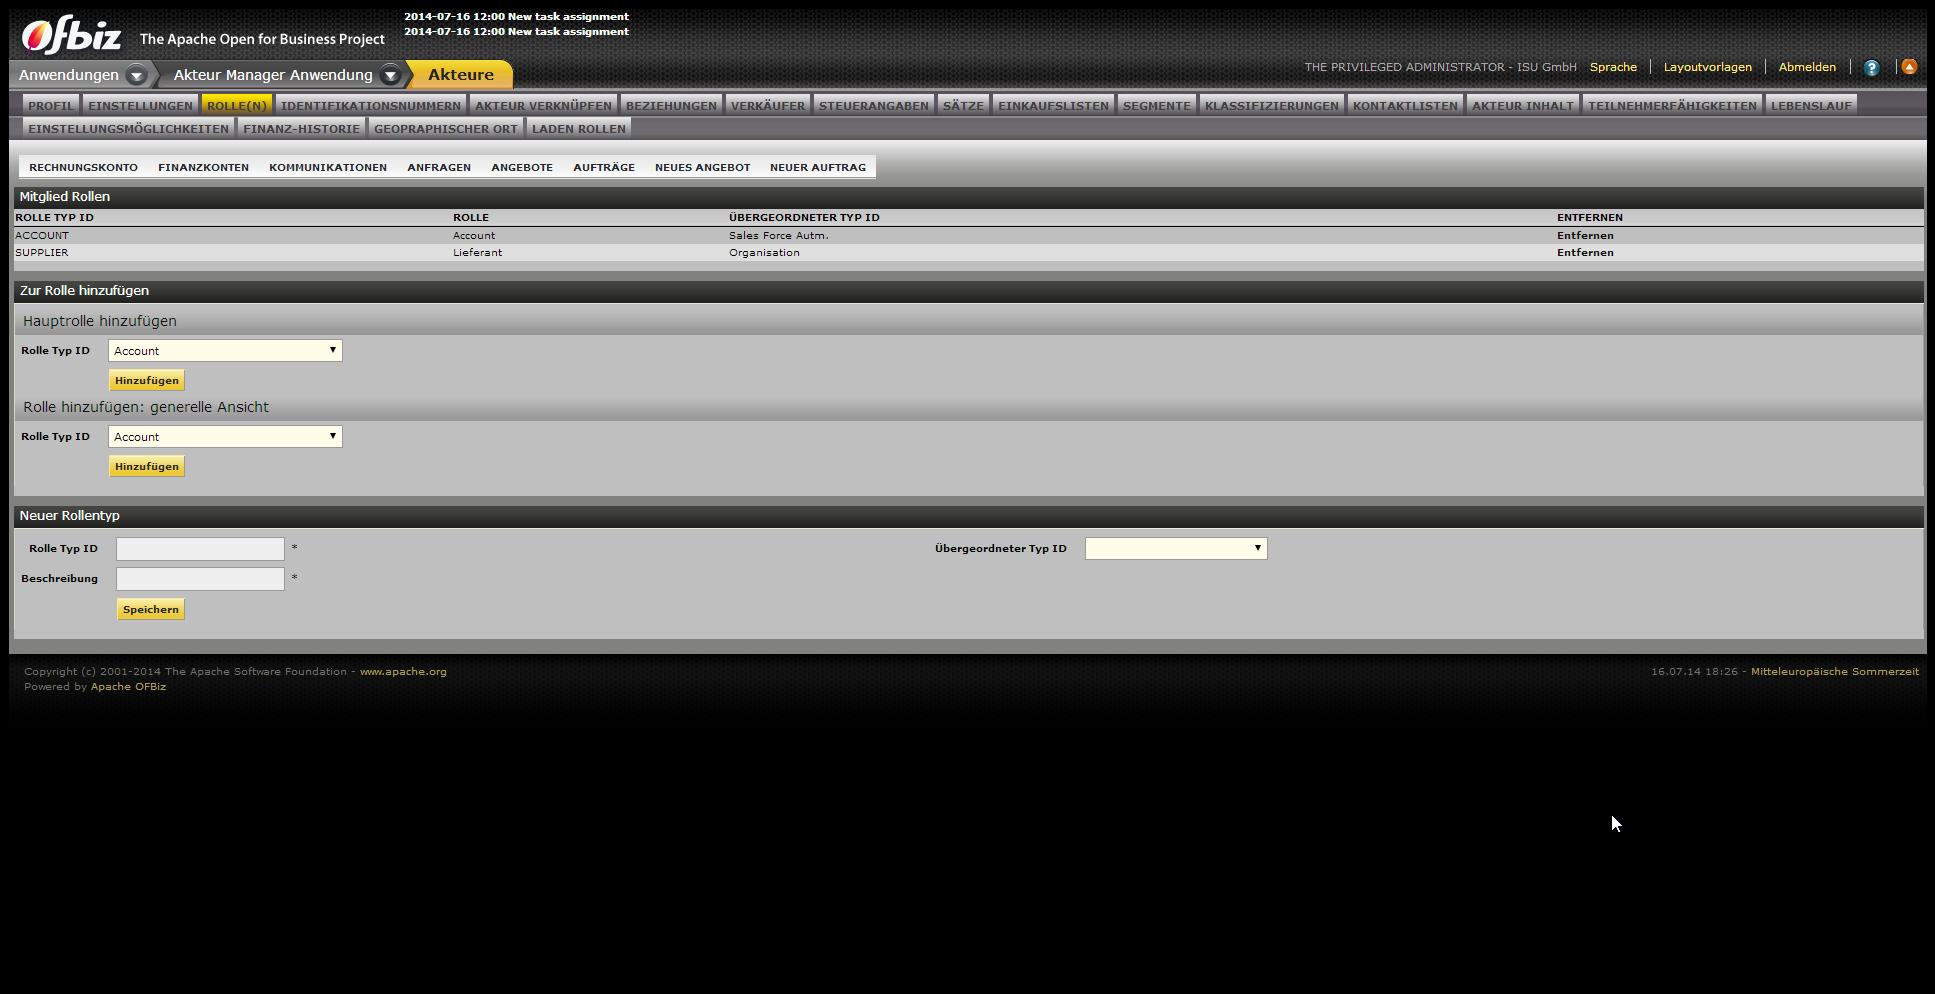 Apache OFBiz Partnerverwaltung